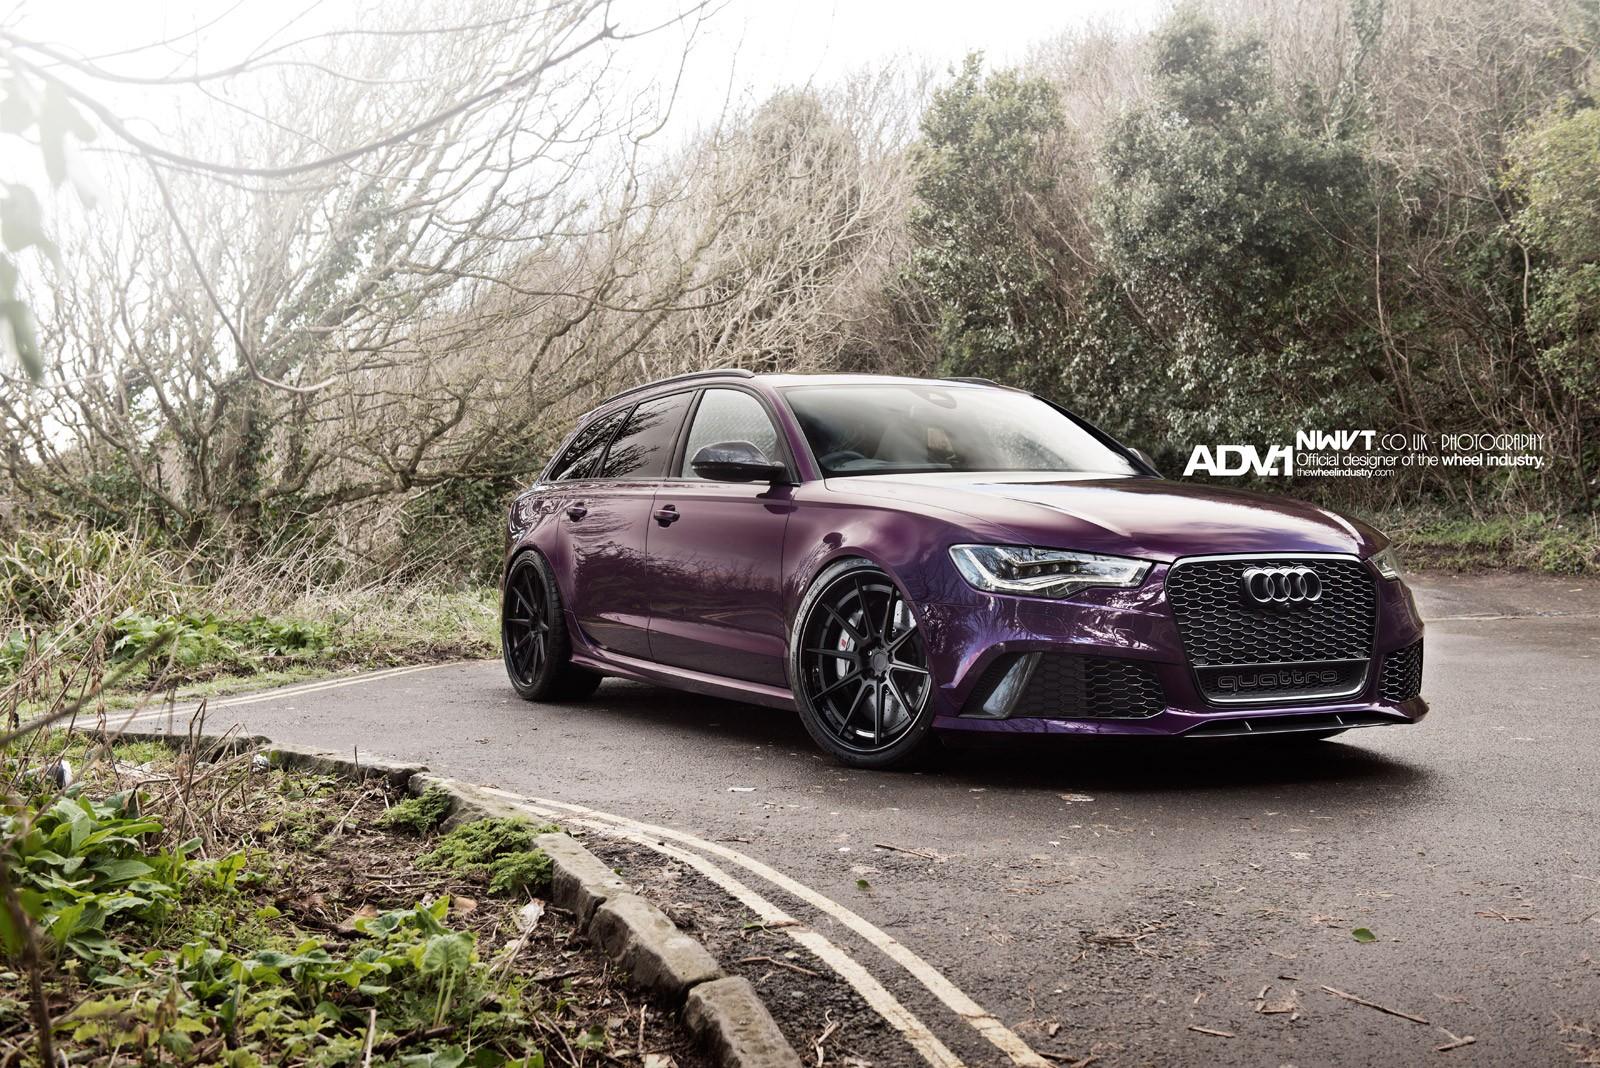 Wallpaper 1600x1068 Px Adv 1 Adv 1 Wheels Audi Quattro Audi